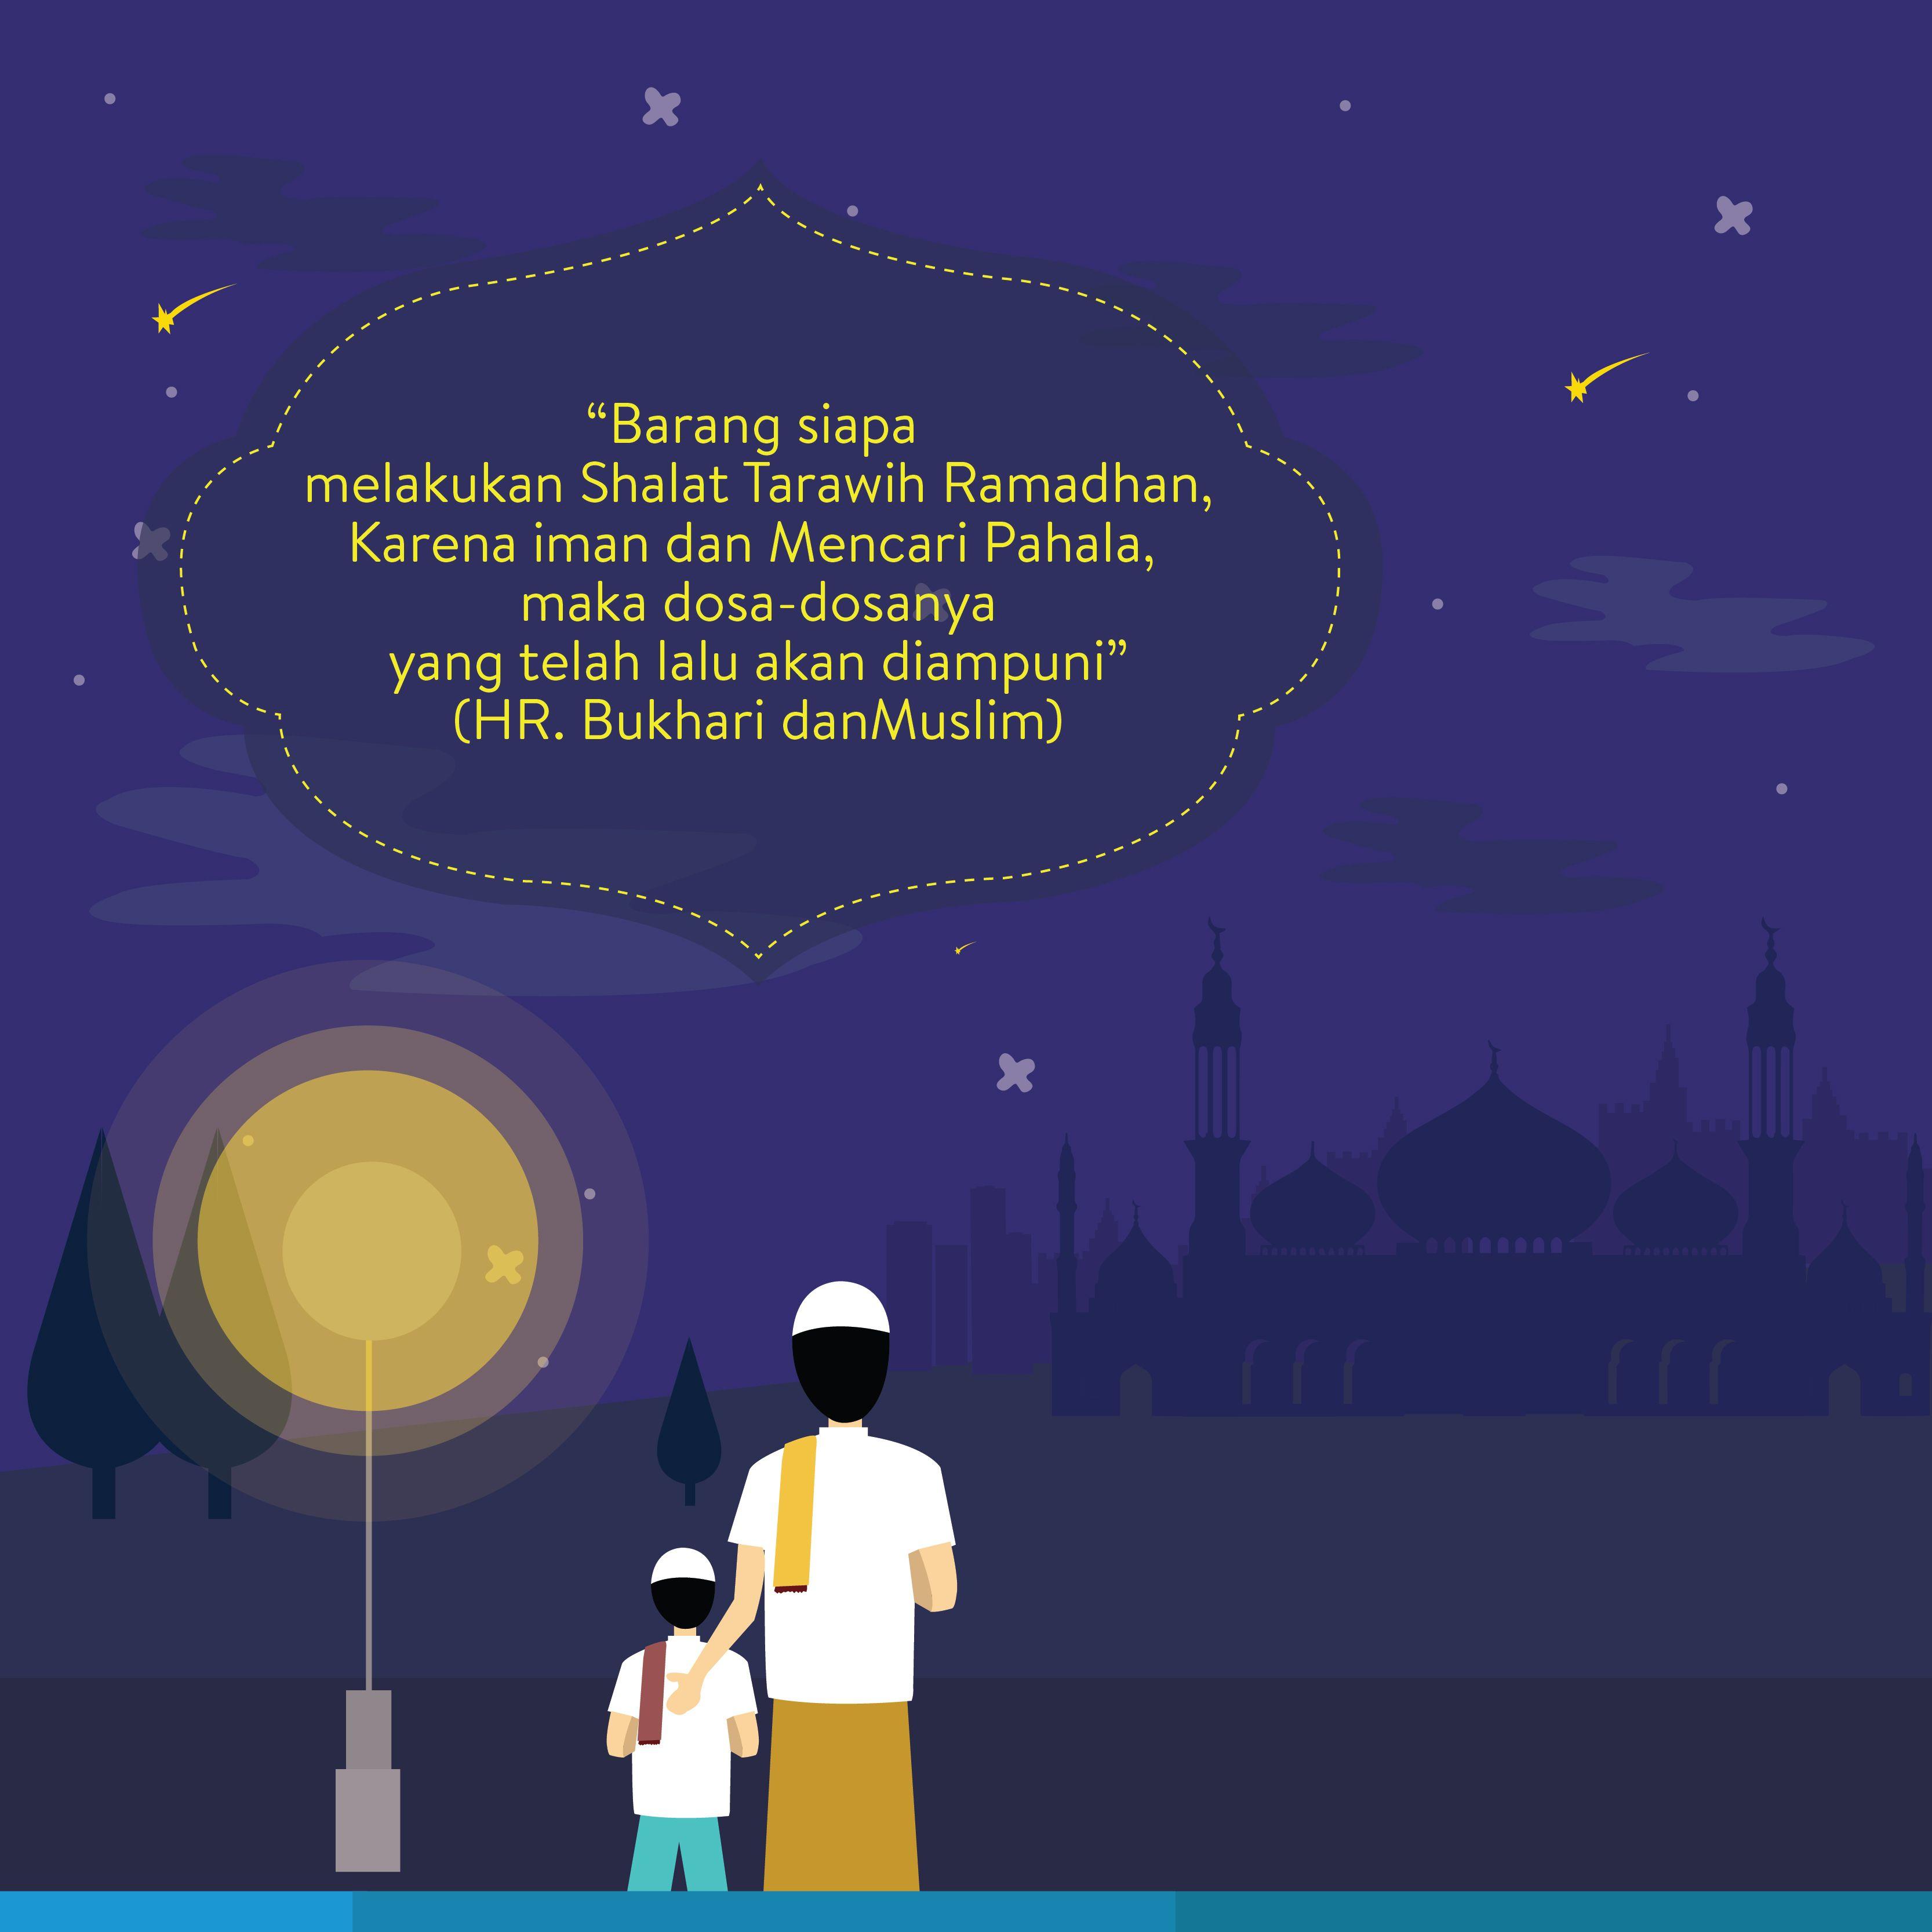 Gambar Kata Ucapan Menyambut Bulan Ramadhan Di 2020 Gambar Kata